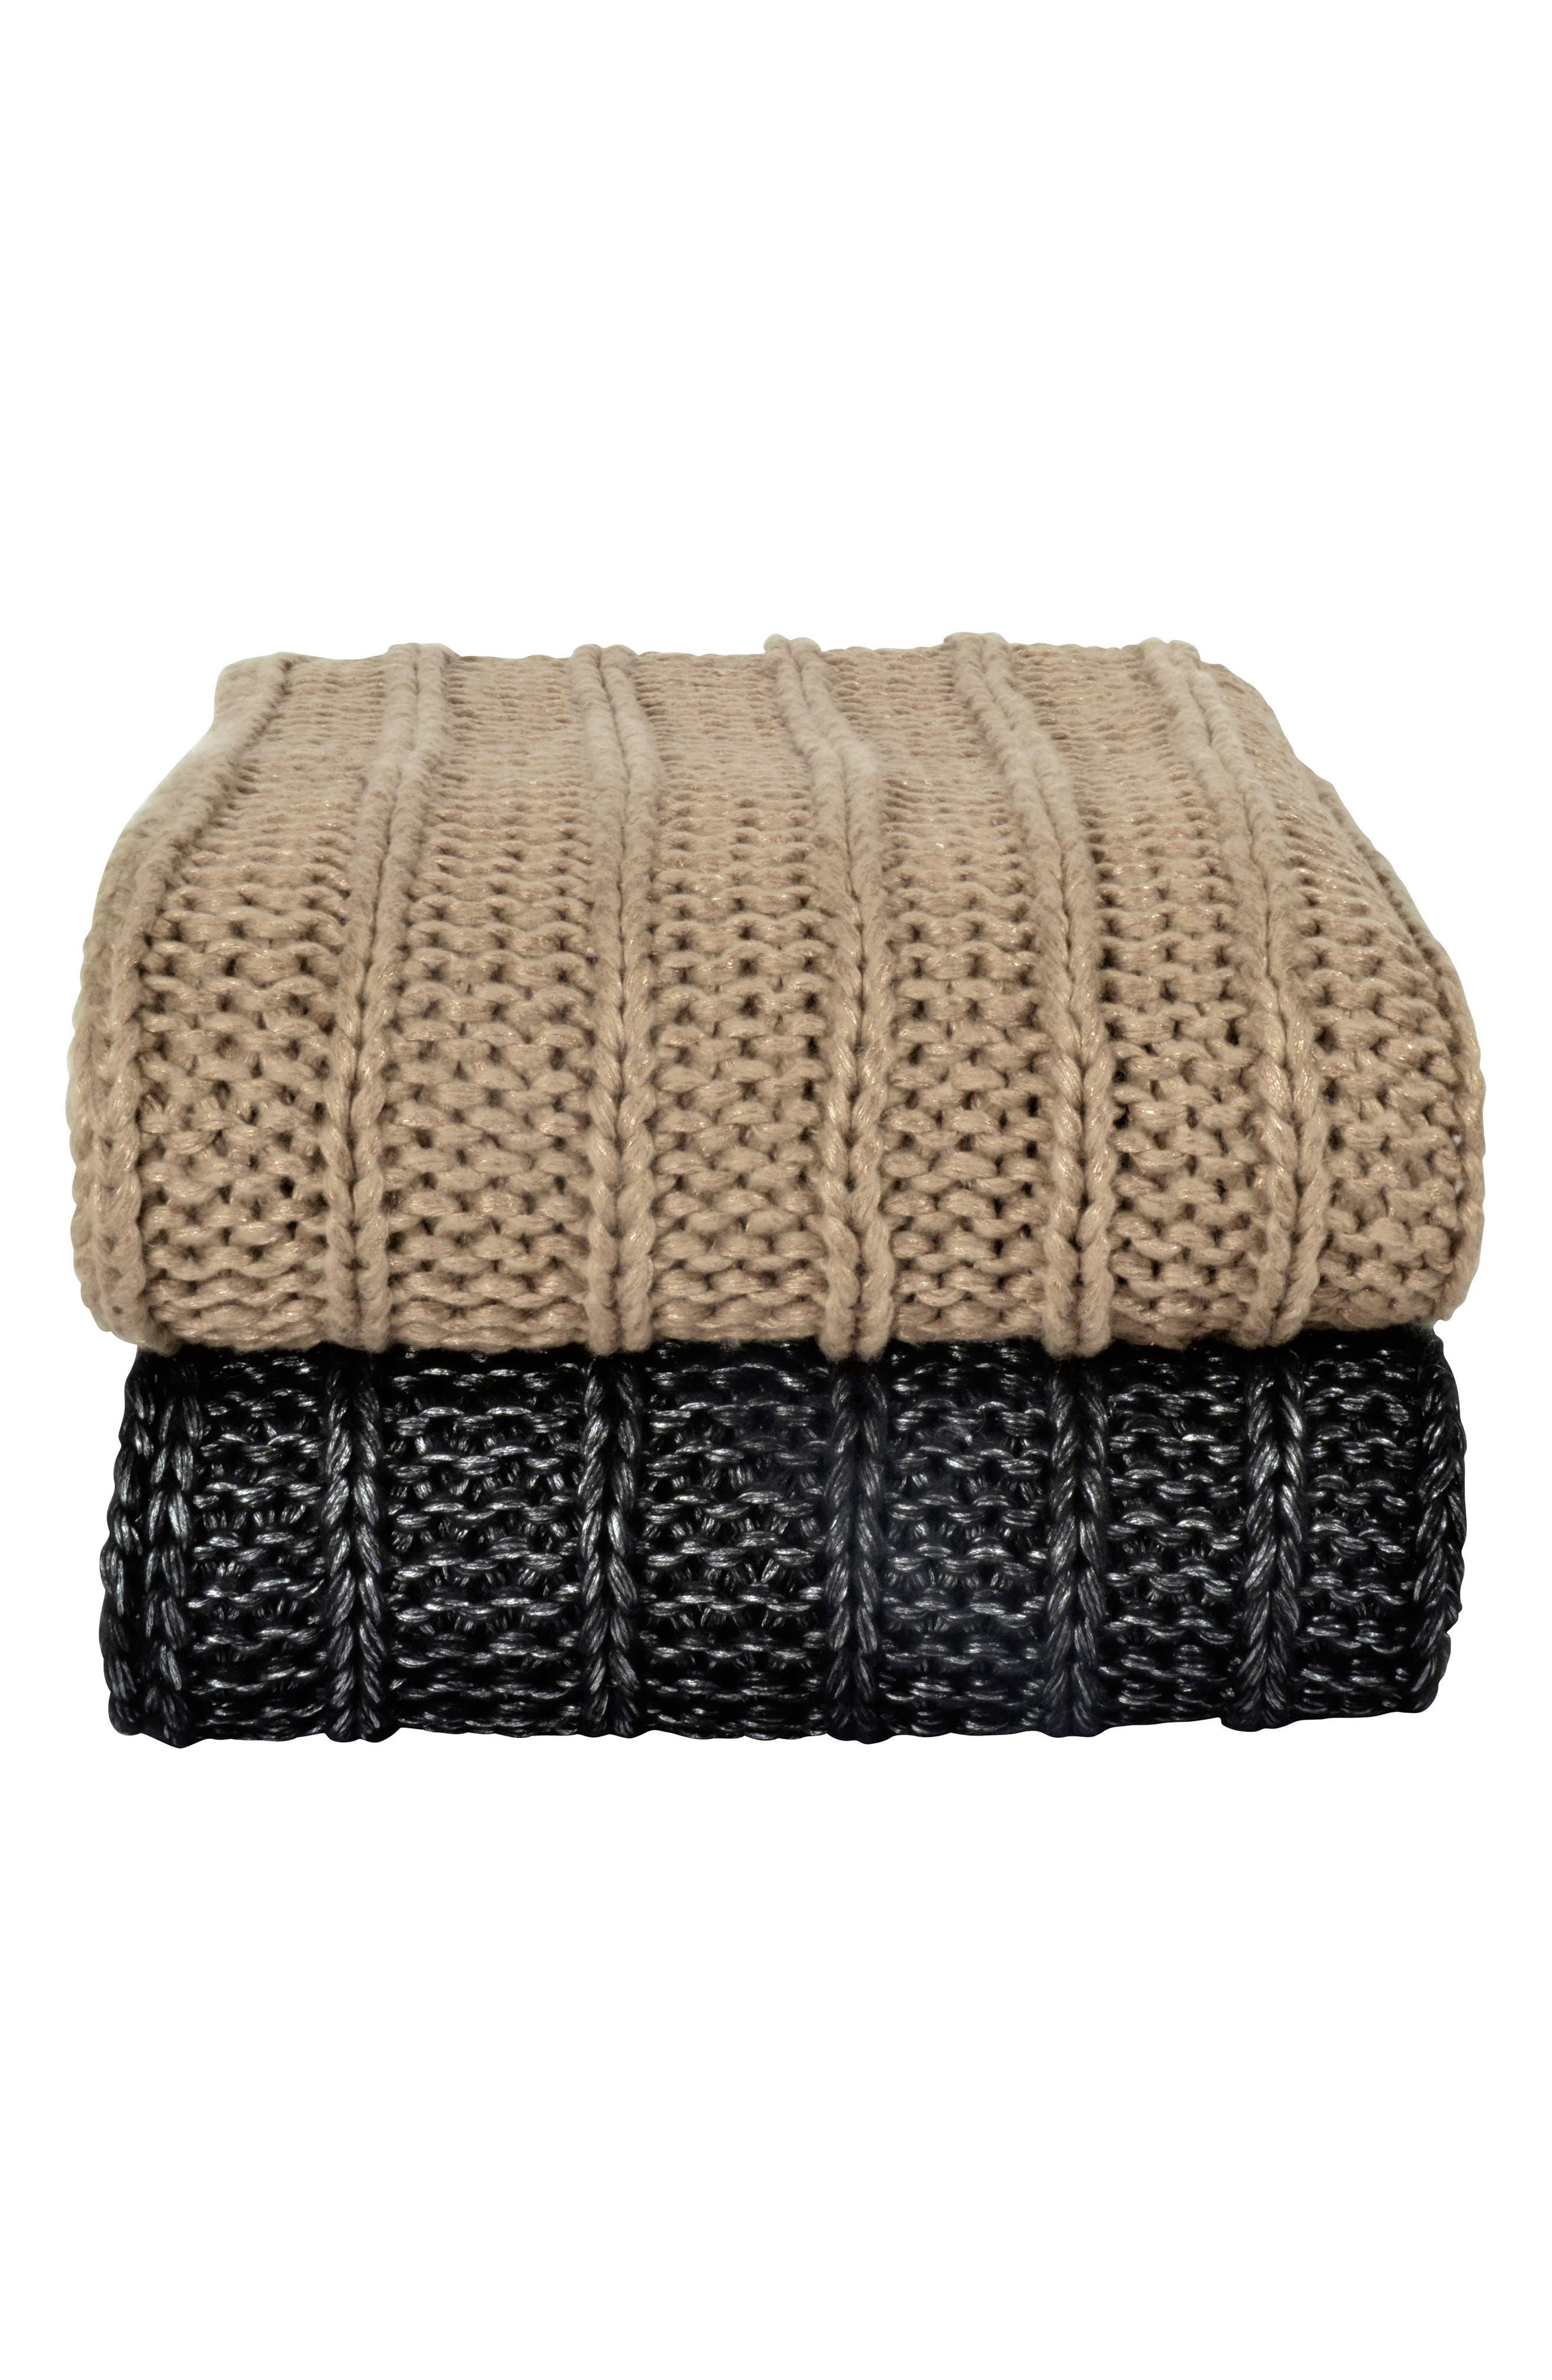 Metallic Rib Knit Throw,                             Alternate thumbnail 2, color,                             CHARCOAL